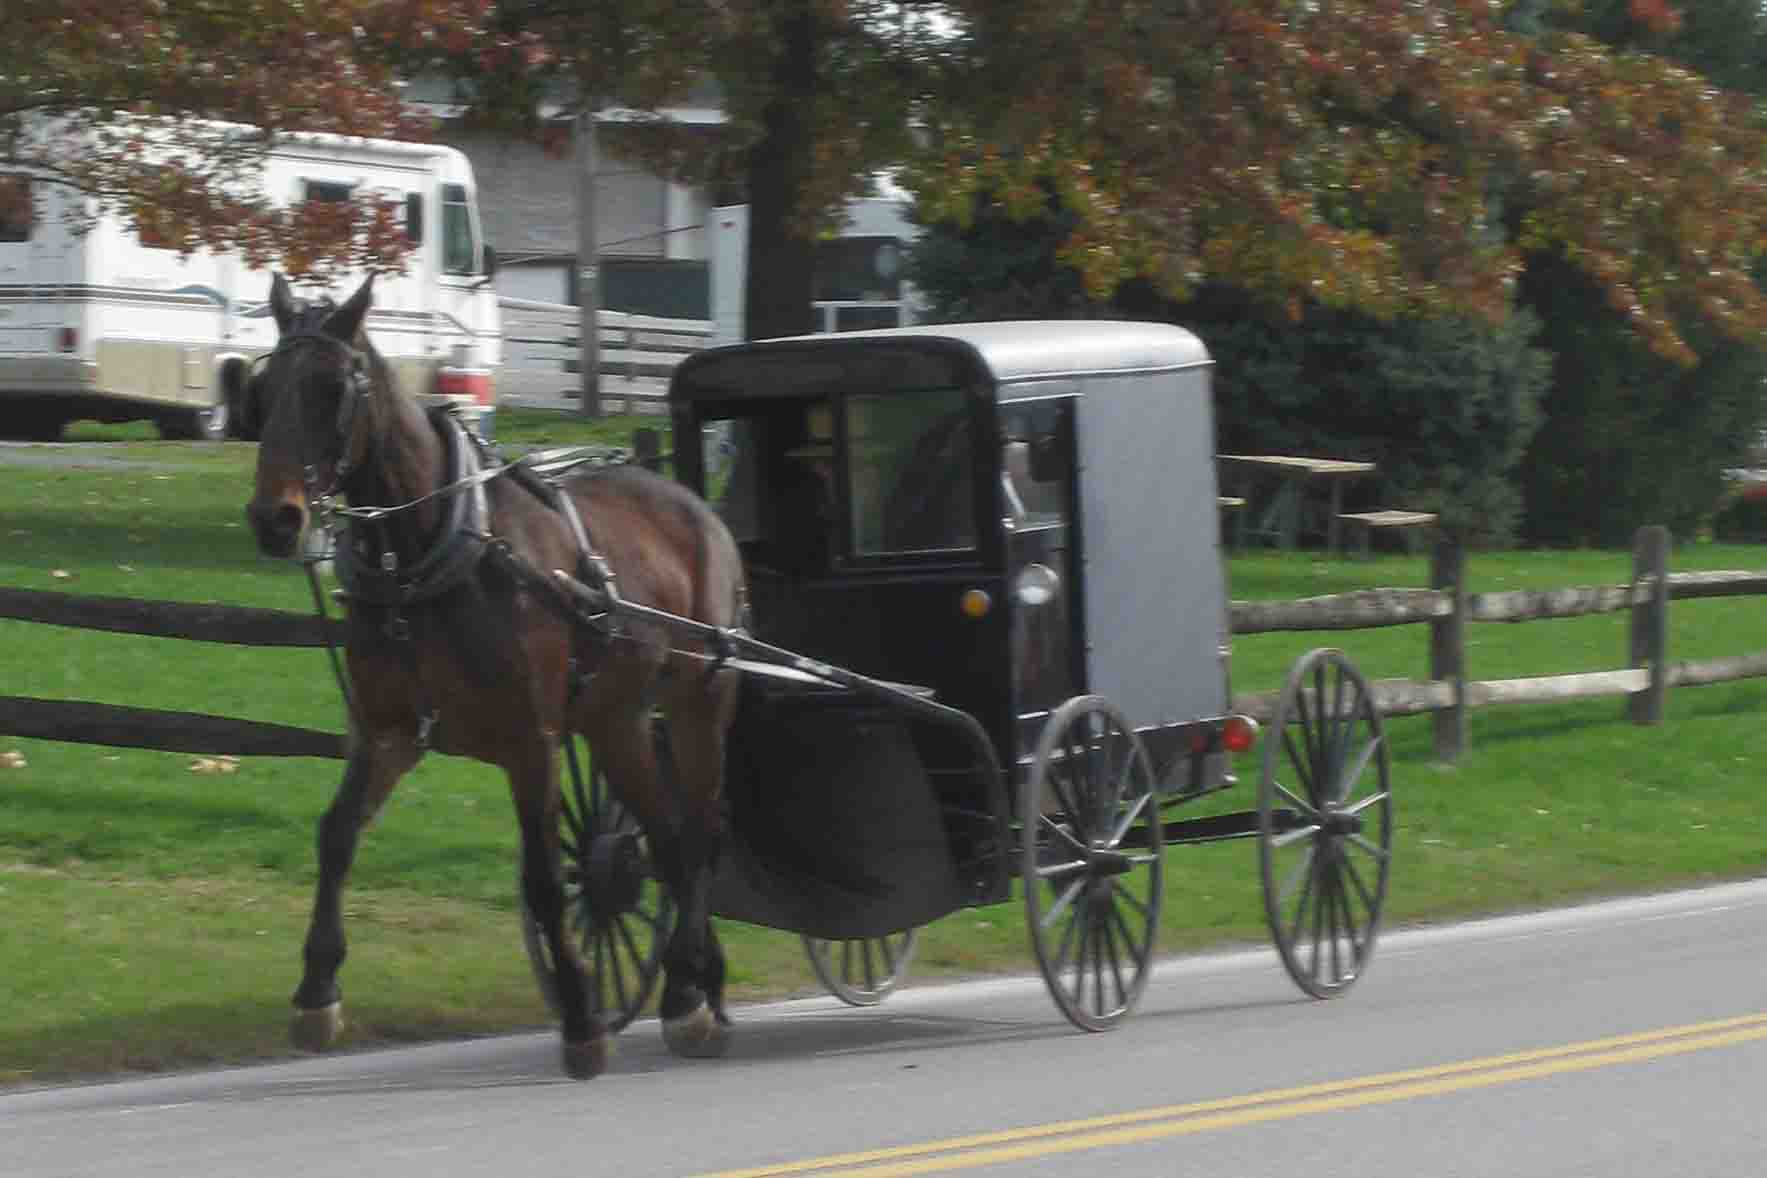 horse and buggy in intercourse, pennsylvania